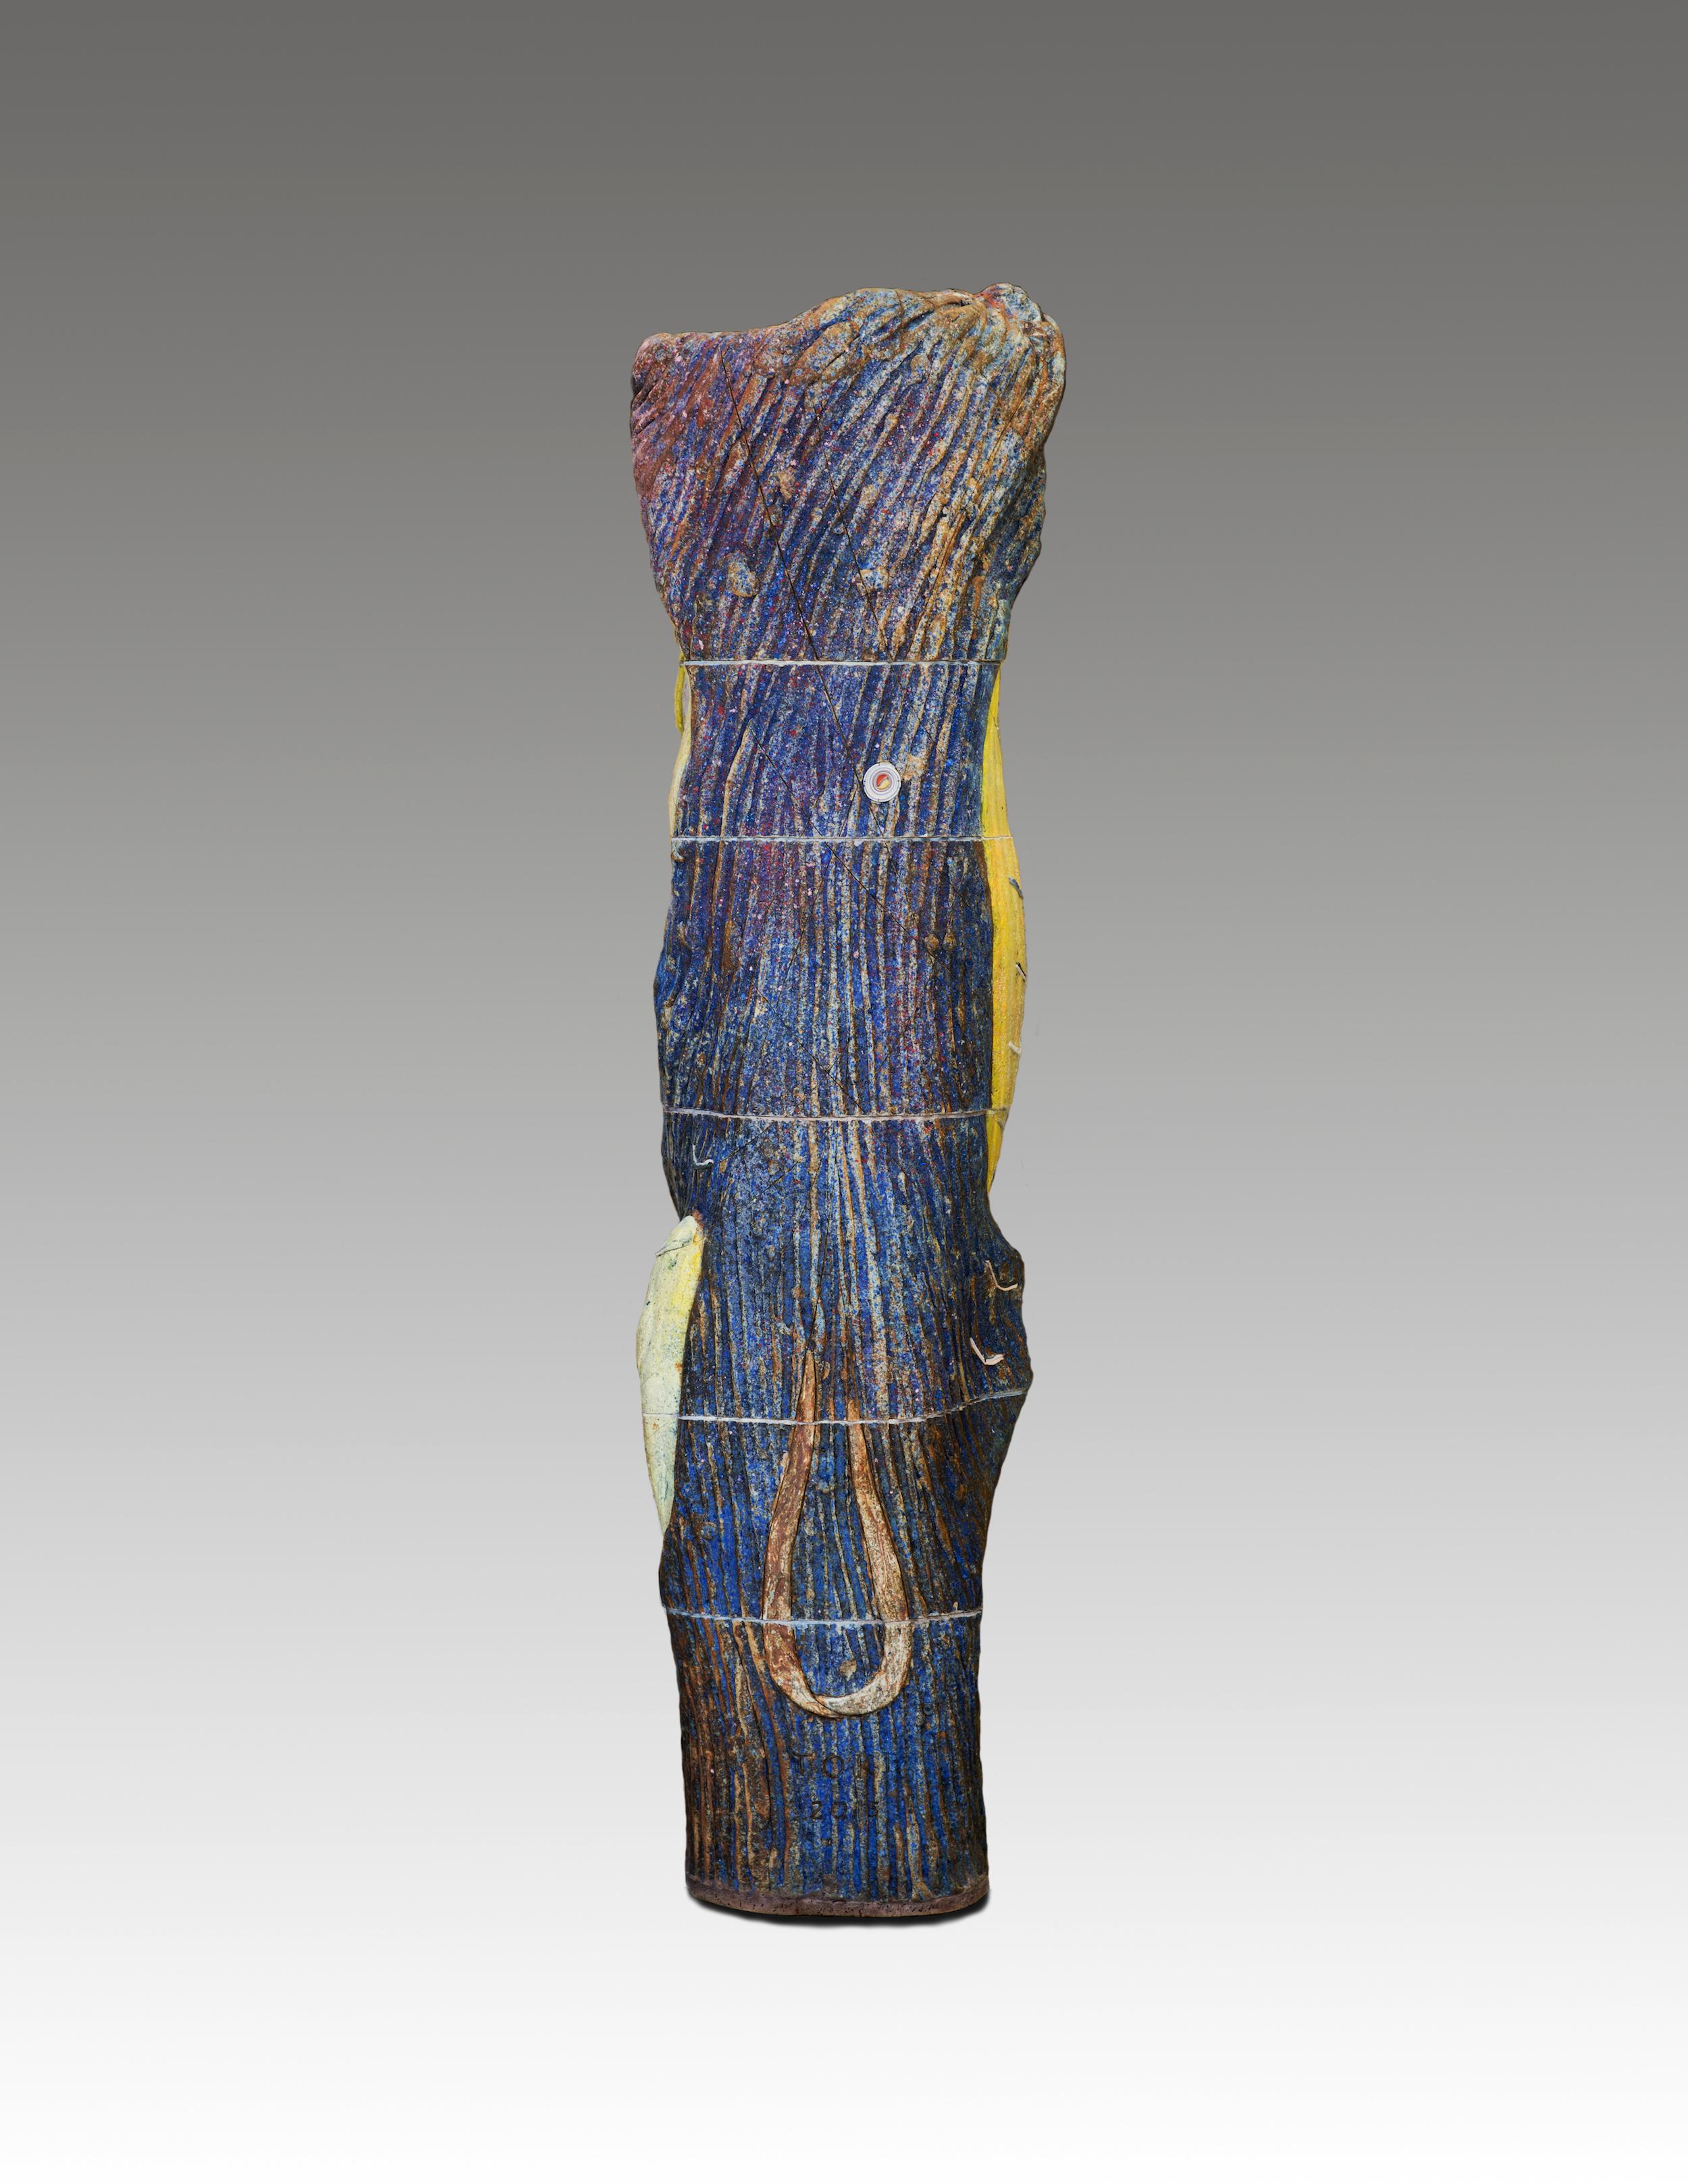 John Toki - Springtime Mirage - 2016 - Ceramic - 7.5'